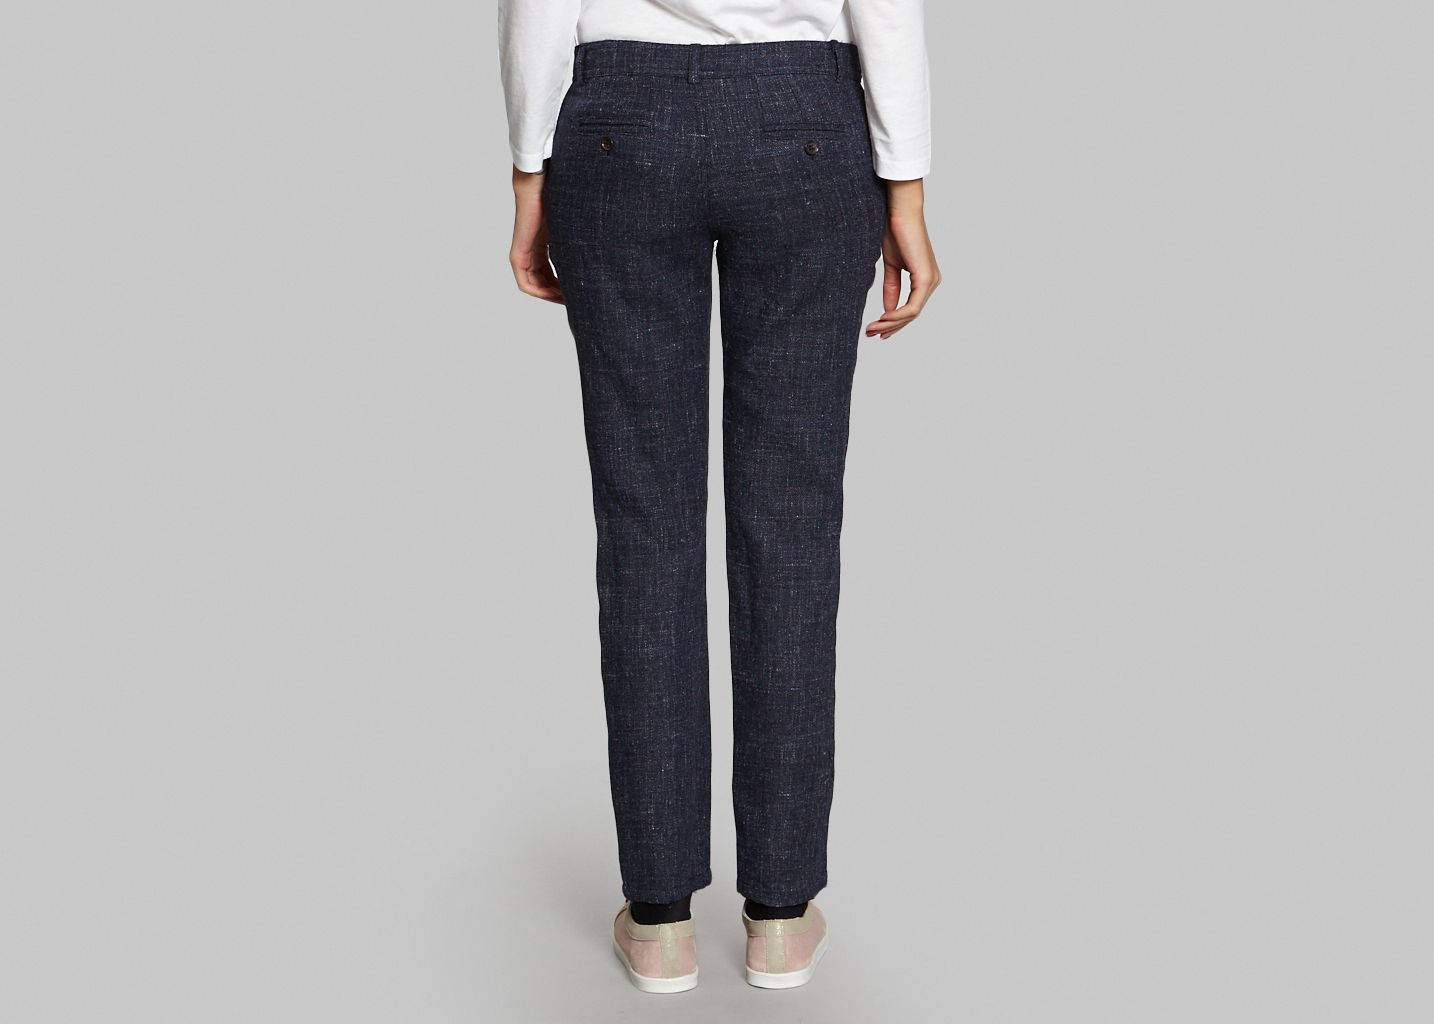 509f244876558 Pantalon Illias Bleu Marine Soeur   L Exception